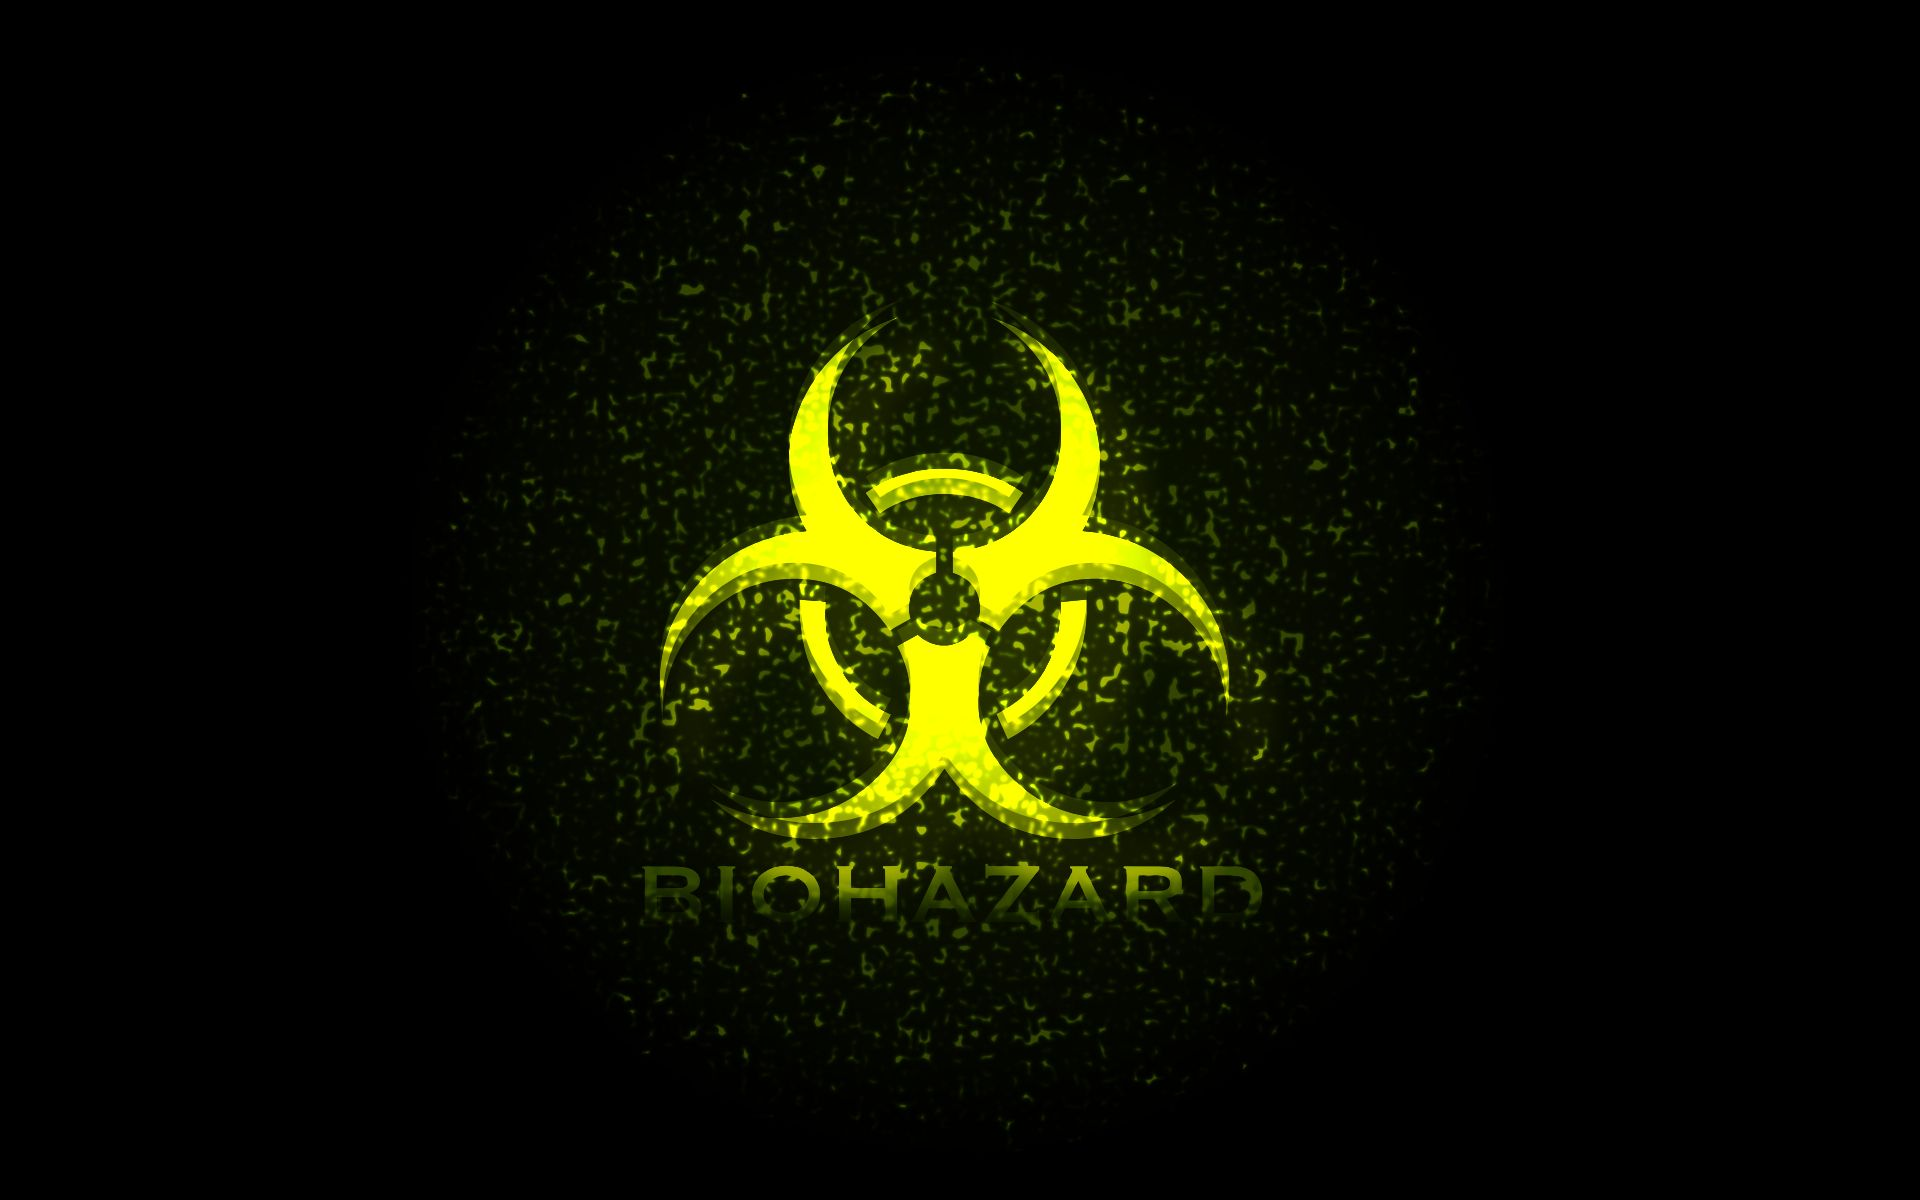 MX Radiation Wallpapers Radiation Adorable Desktop Pictures.